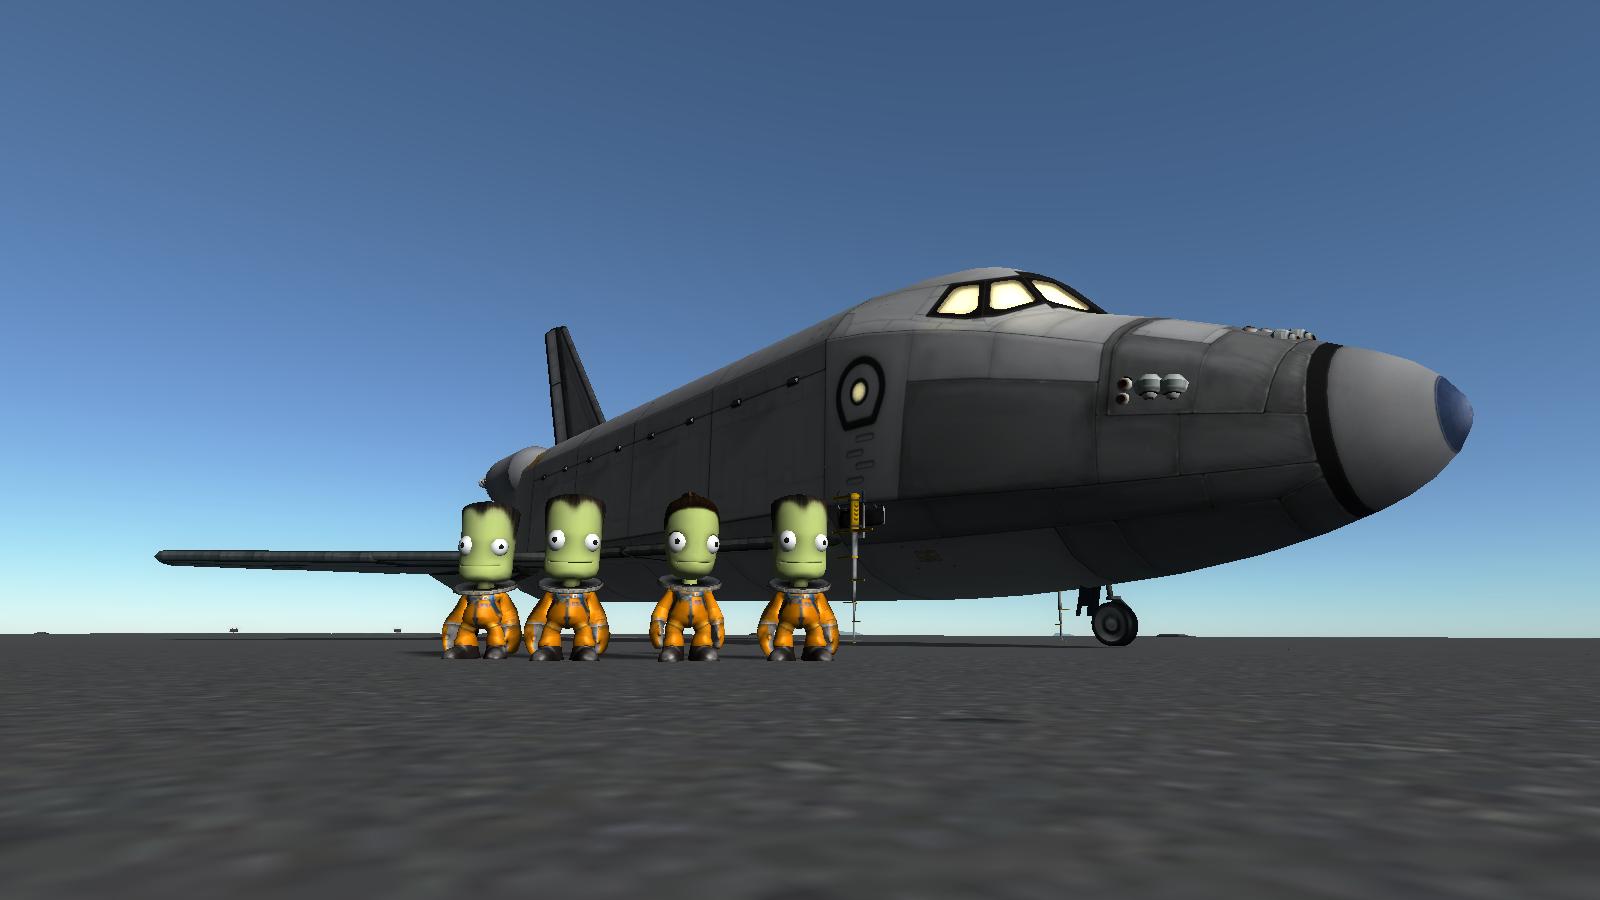 STS-7/E Space Shuttle (Stock NASA Replica) Still Flies in ...